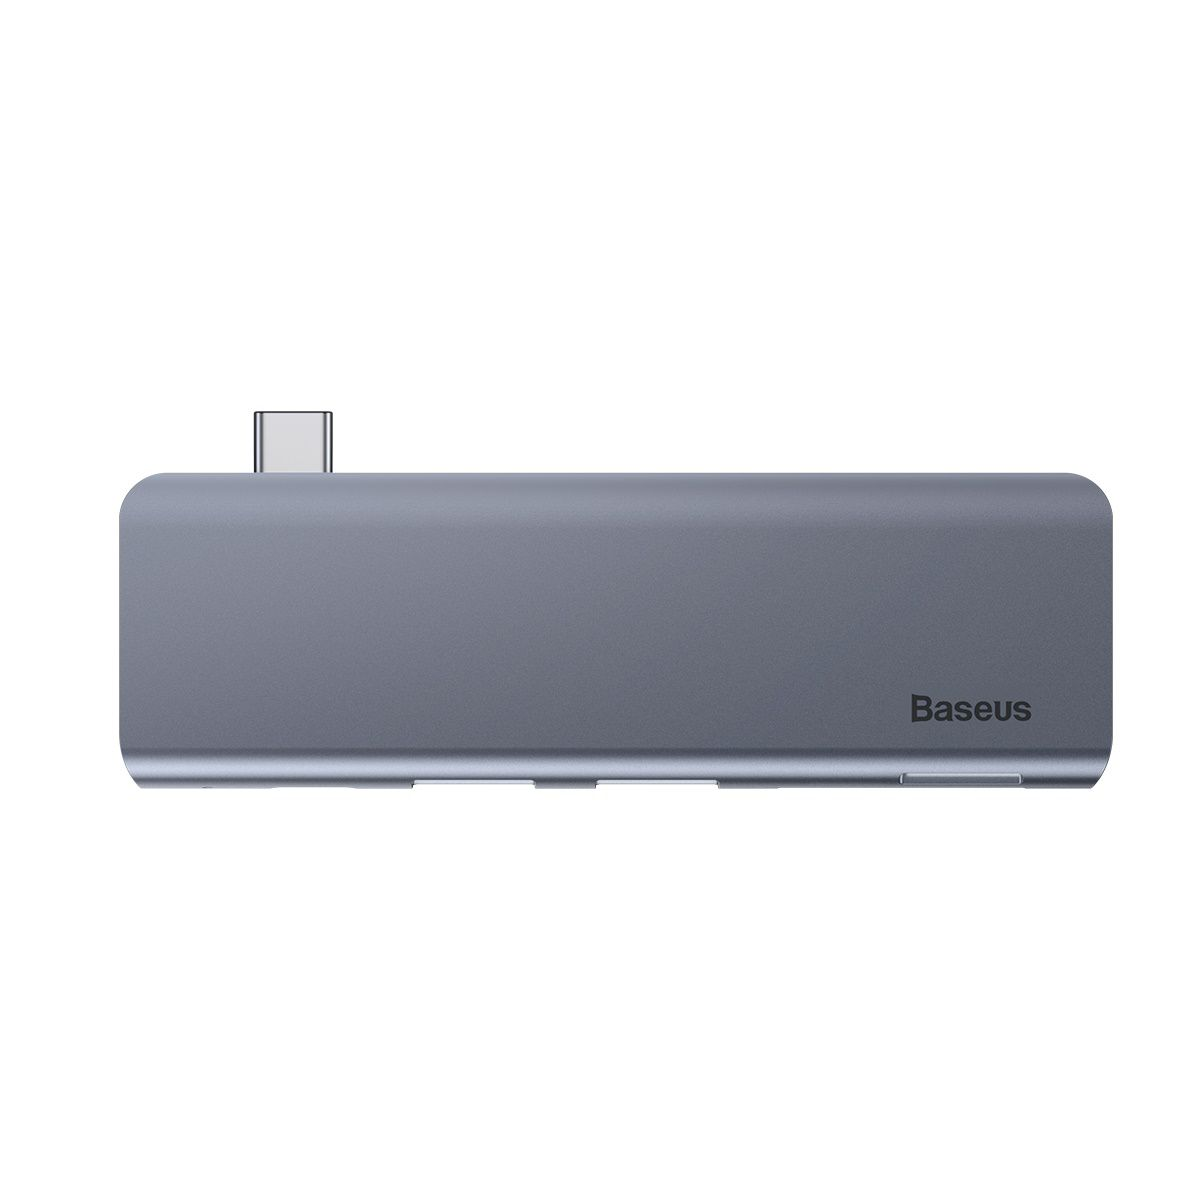 HUB Baseus Harmonica 5n1 Type-C + 2 USB + SD + Micro SD